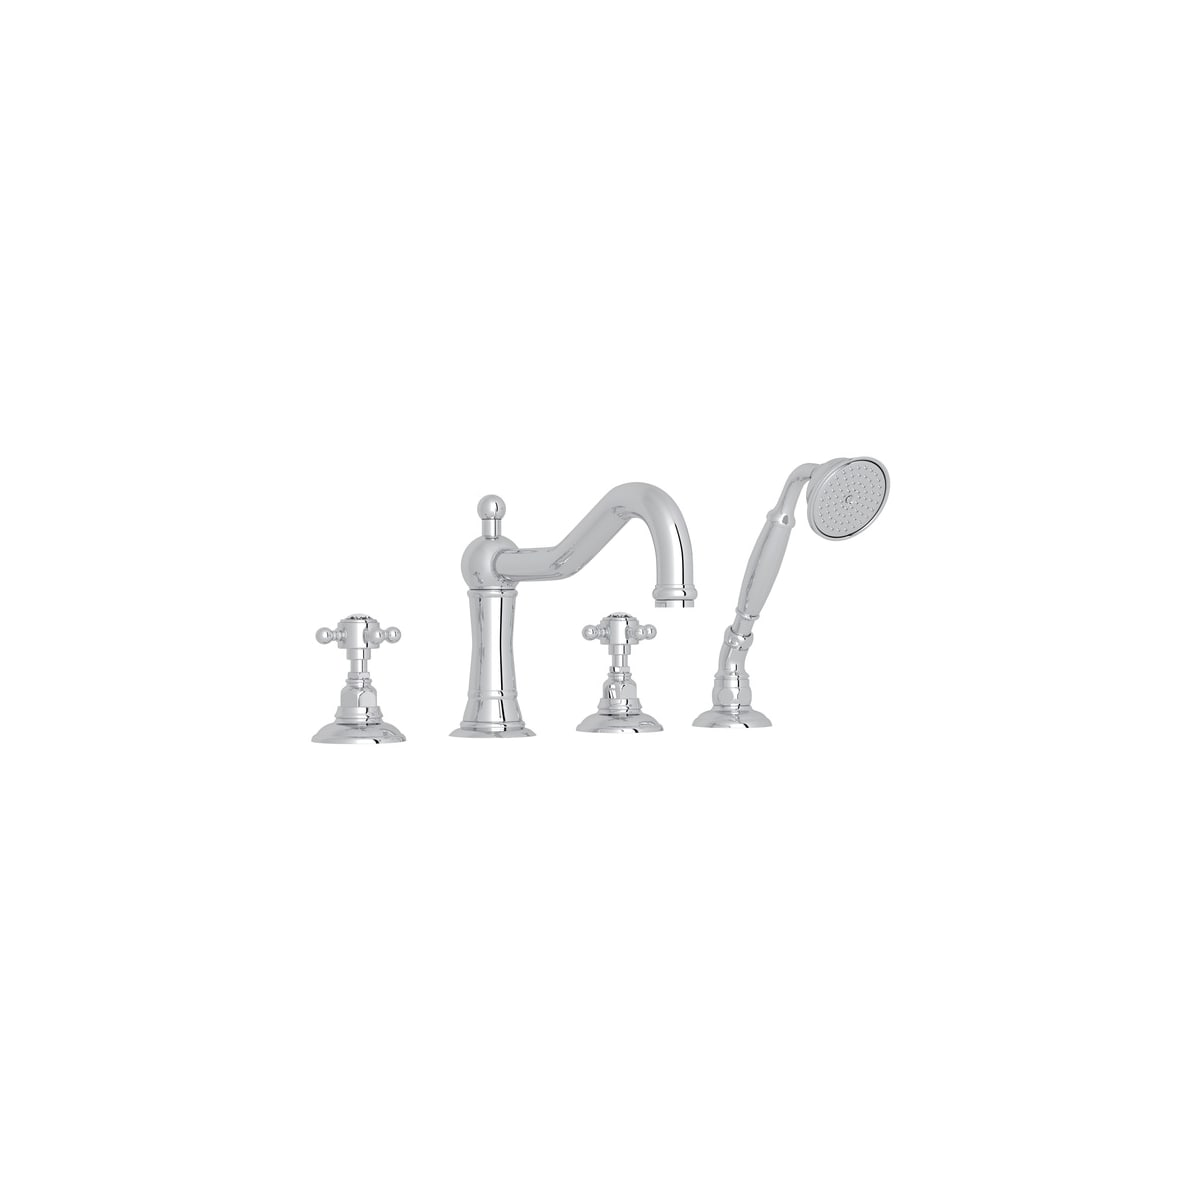 Rohl A1404xctcb Tuscan Brass Country Bath Roman Tub Faucet